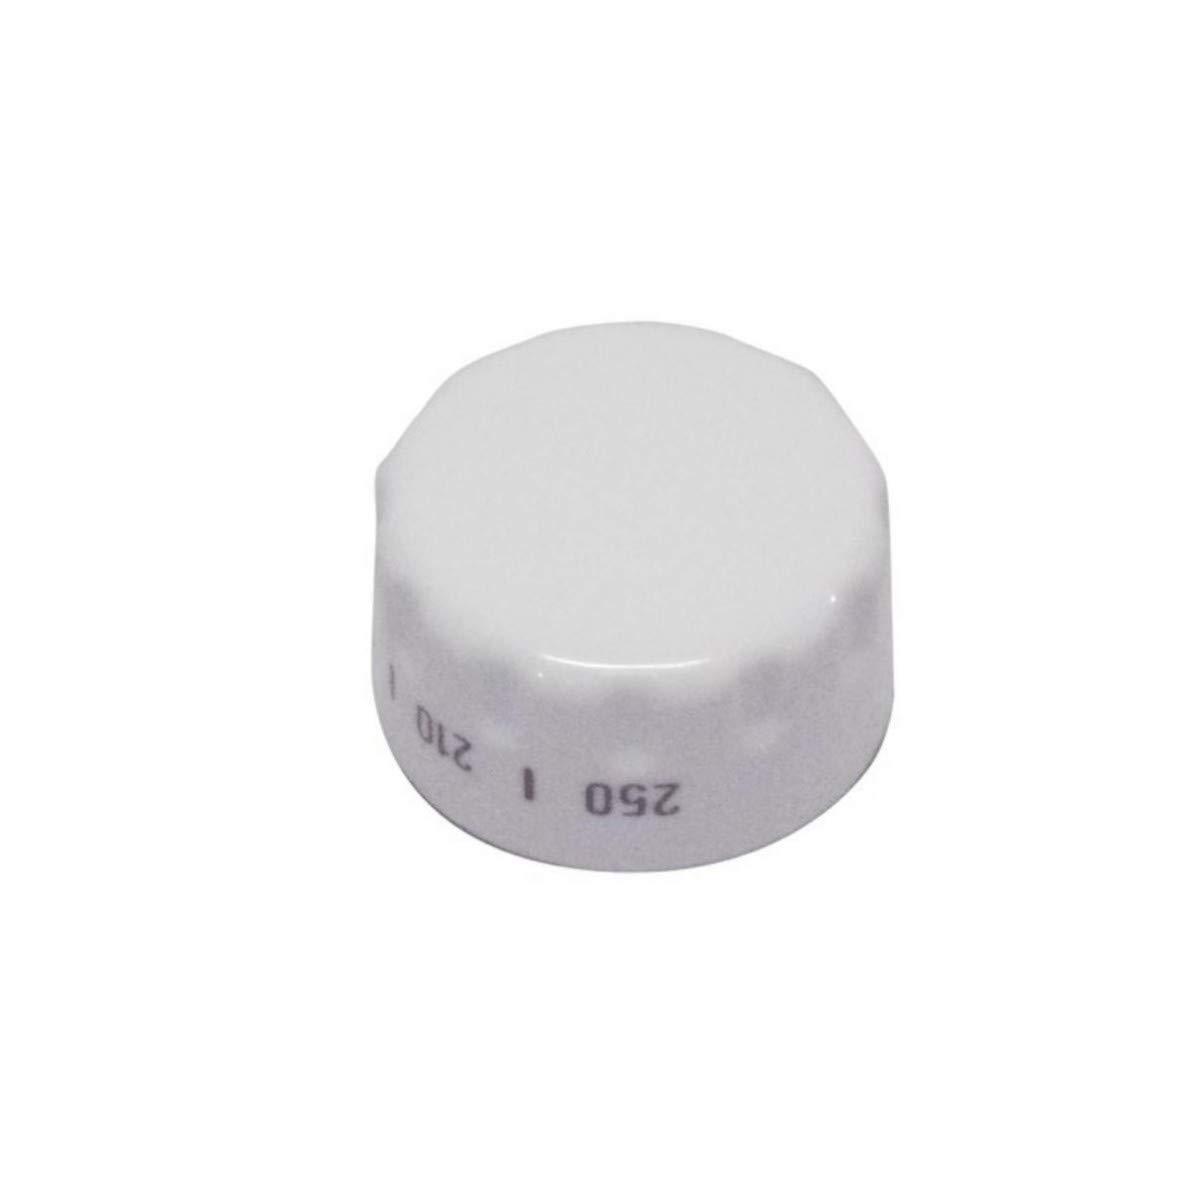 Recamania Mando termostato Horno Teka HE510ME 99512929: Amazon.es